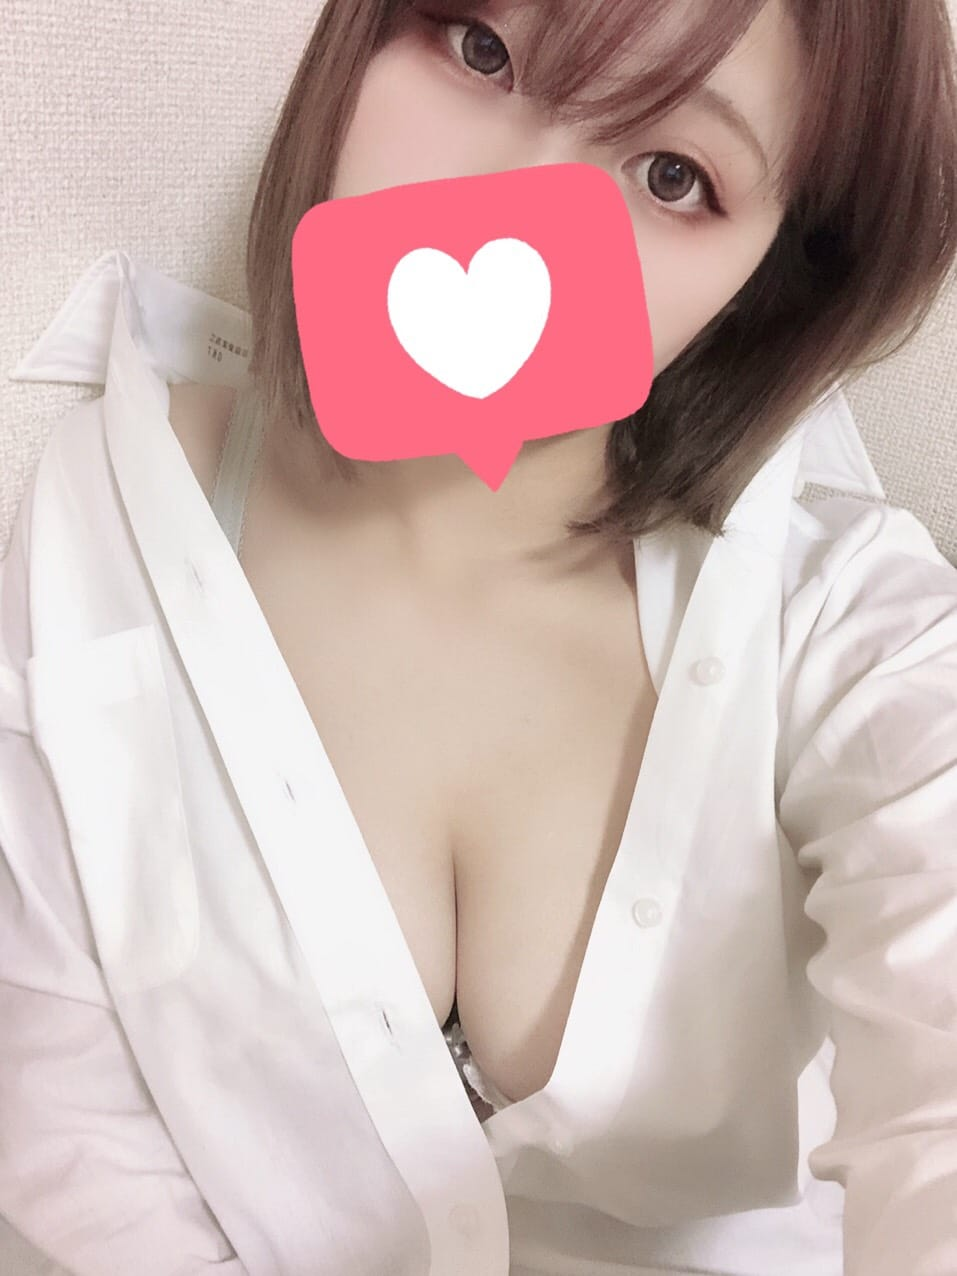 azusa(あずさ)